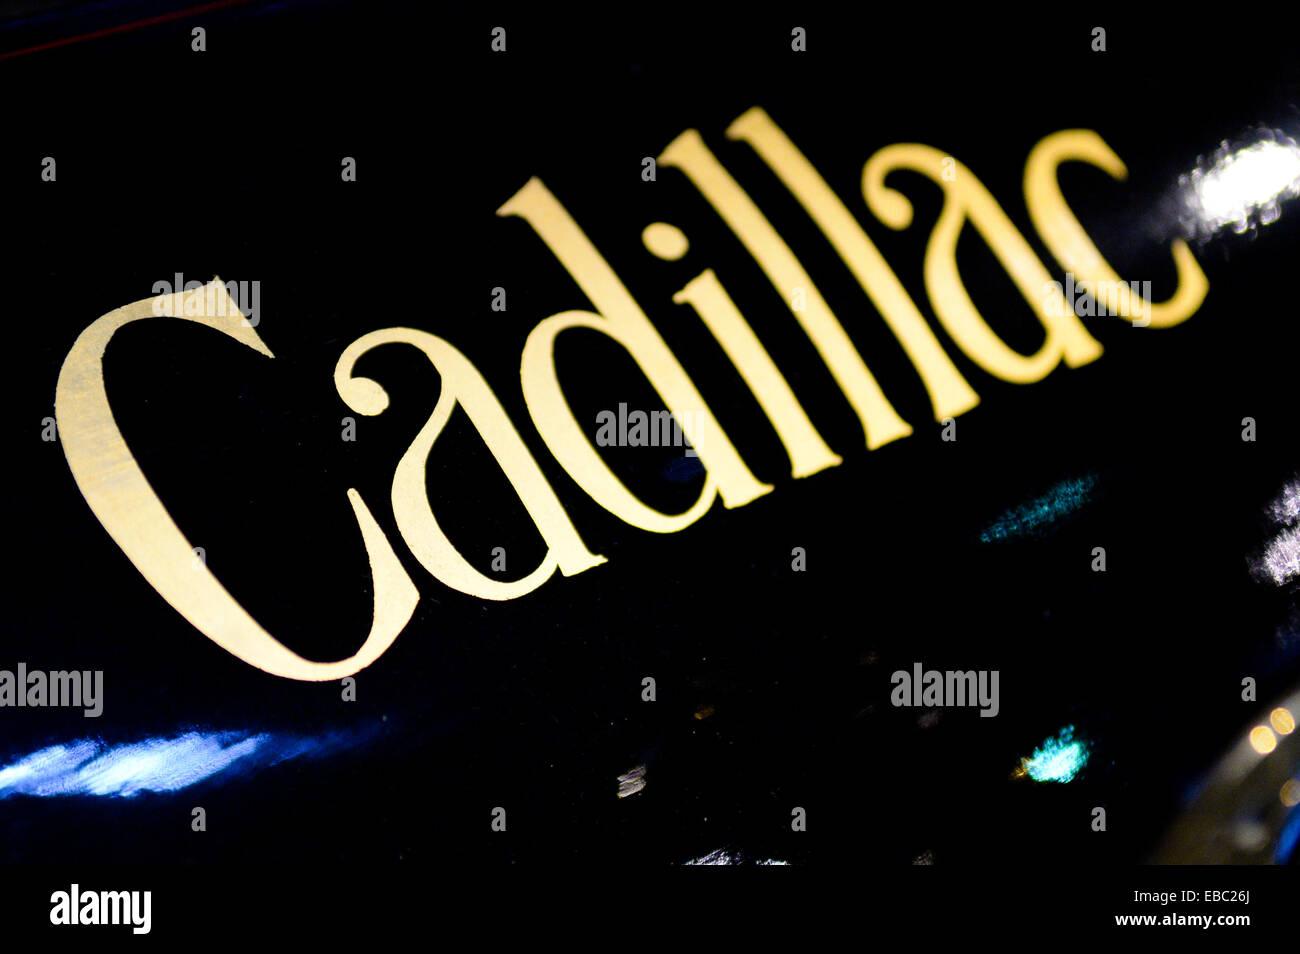 Old Cadillac logo - Stock Image